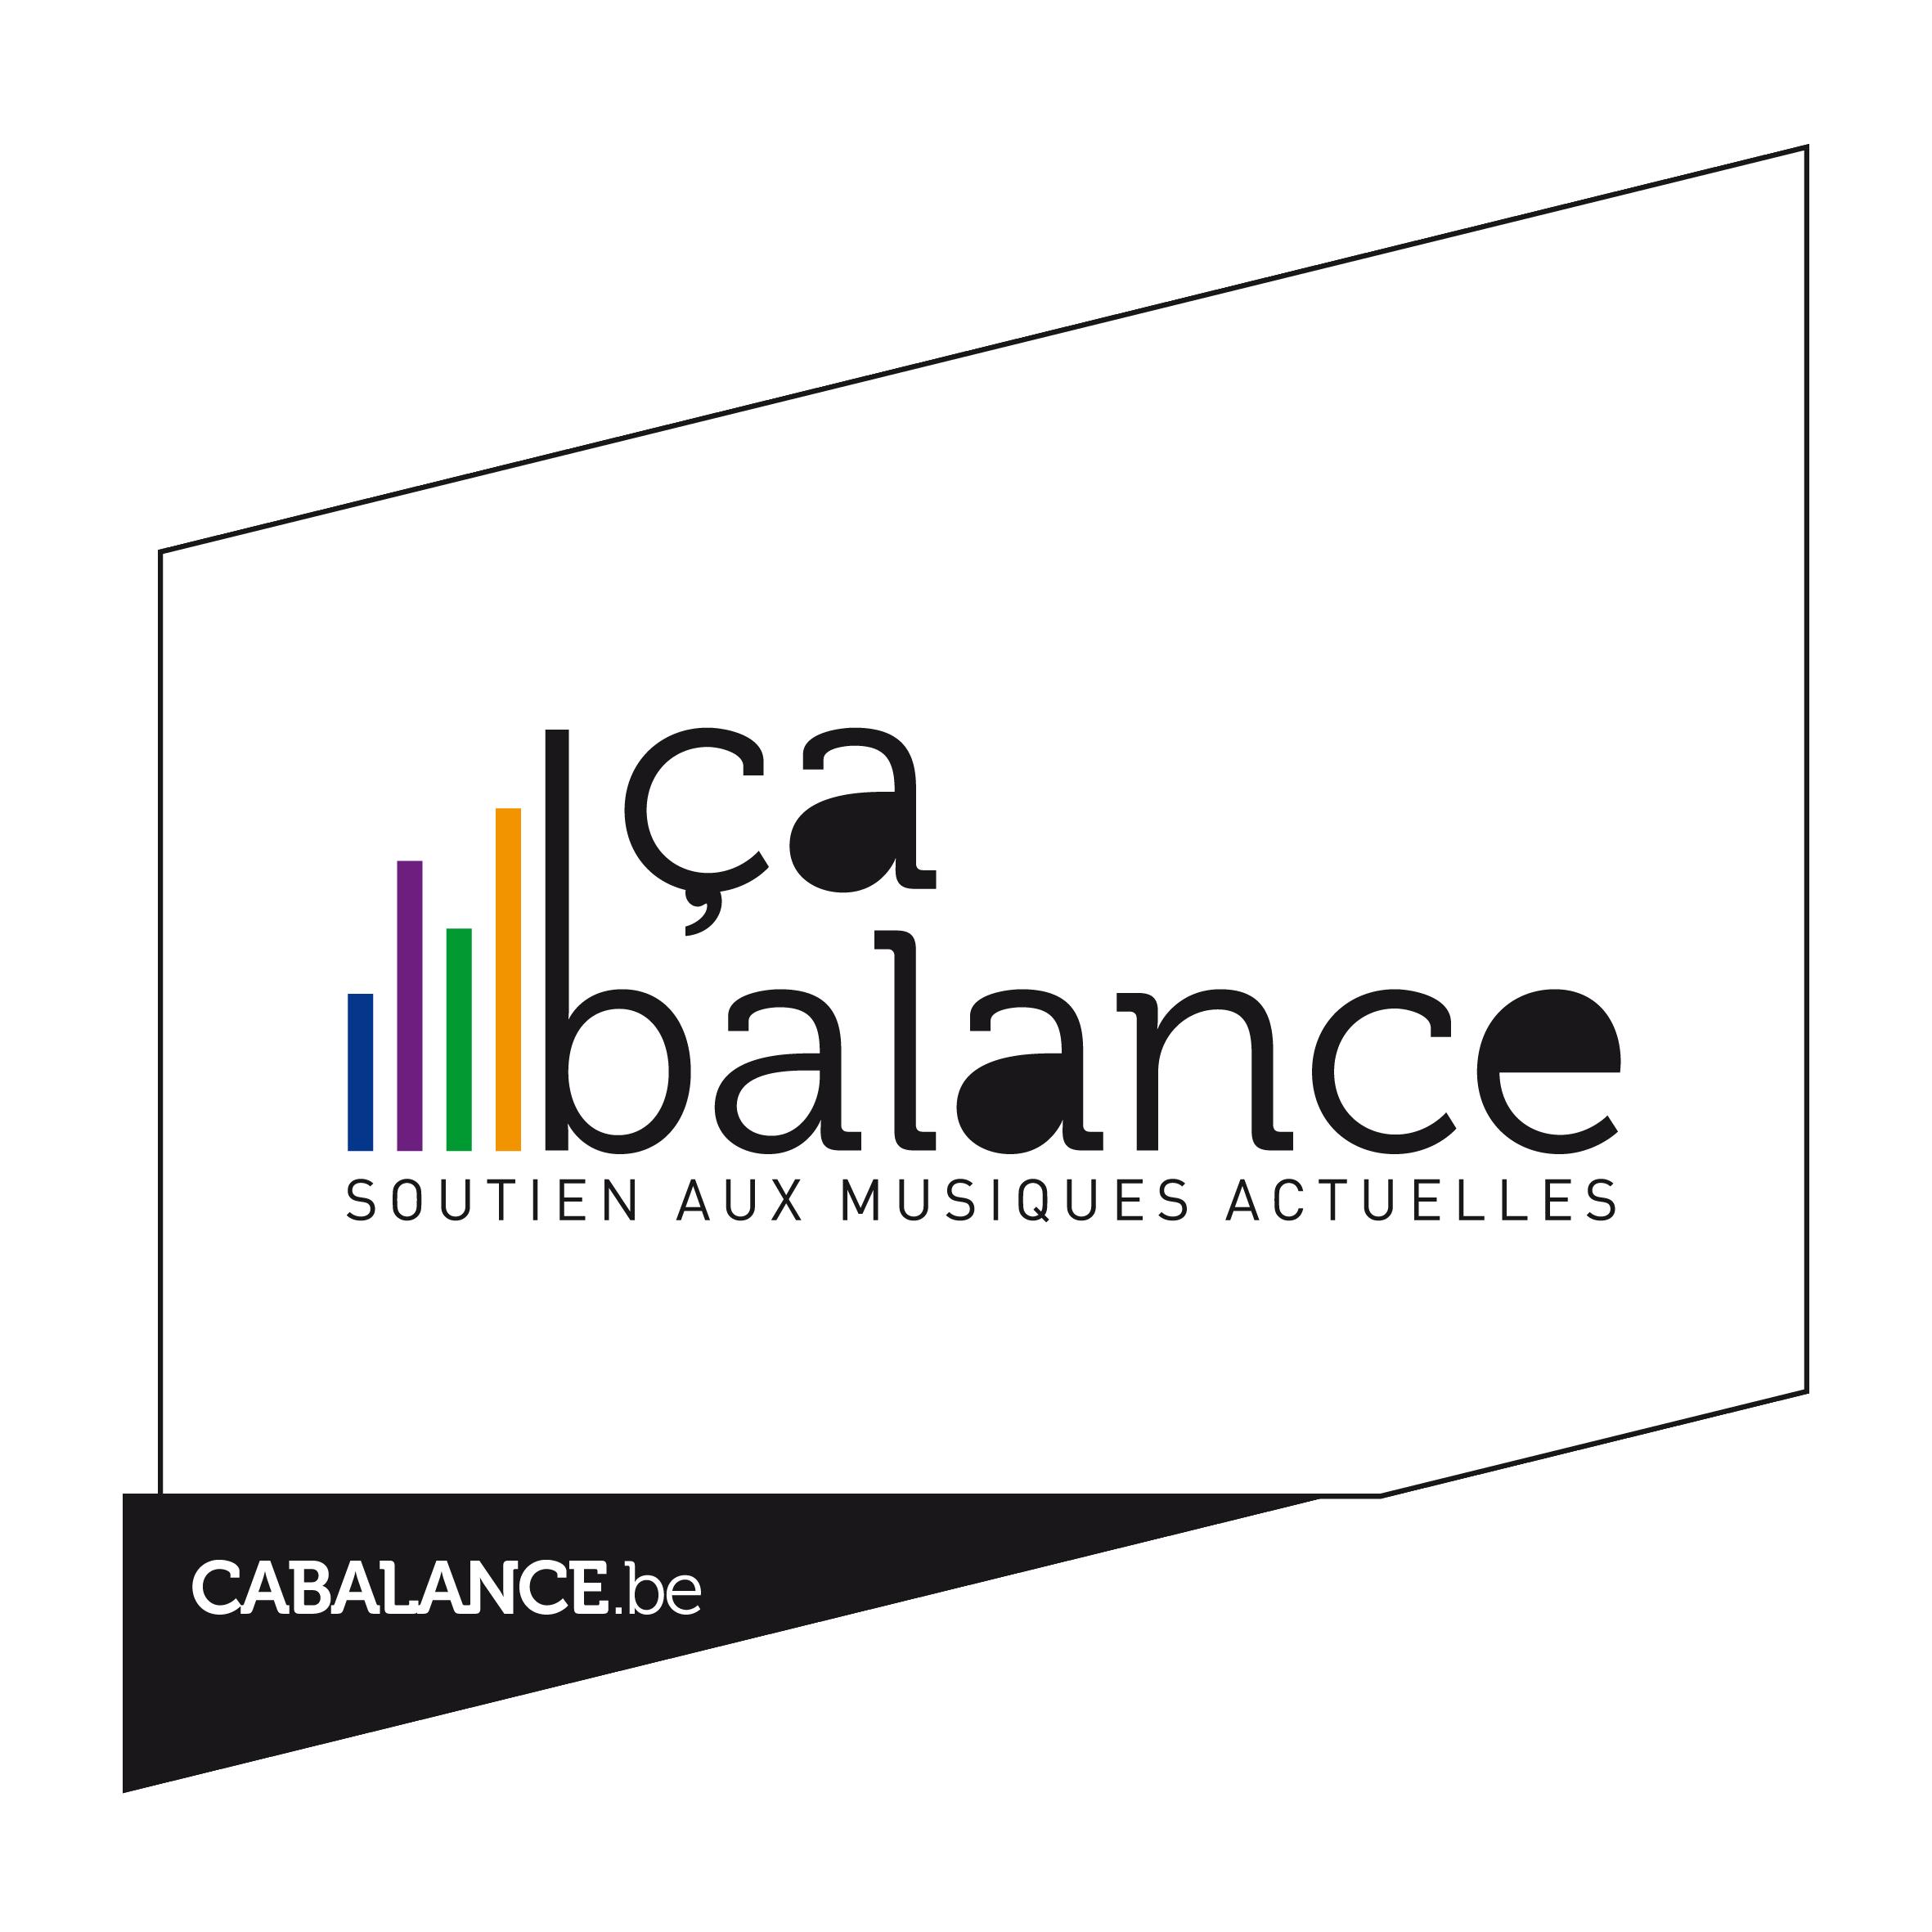 cabalance_cmjn-2 - copie